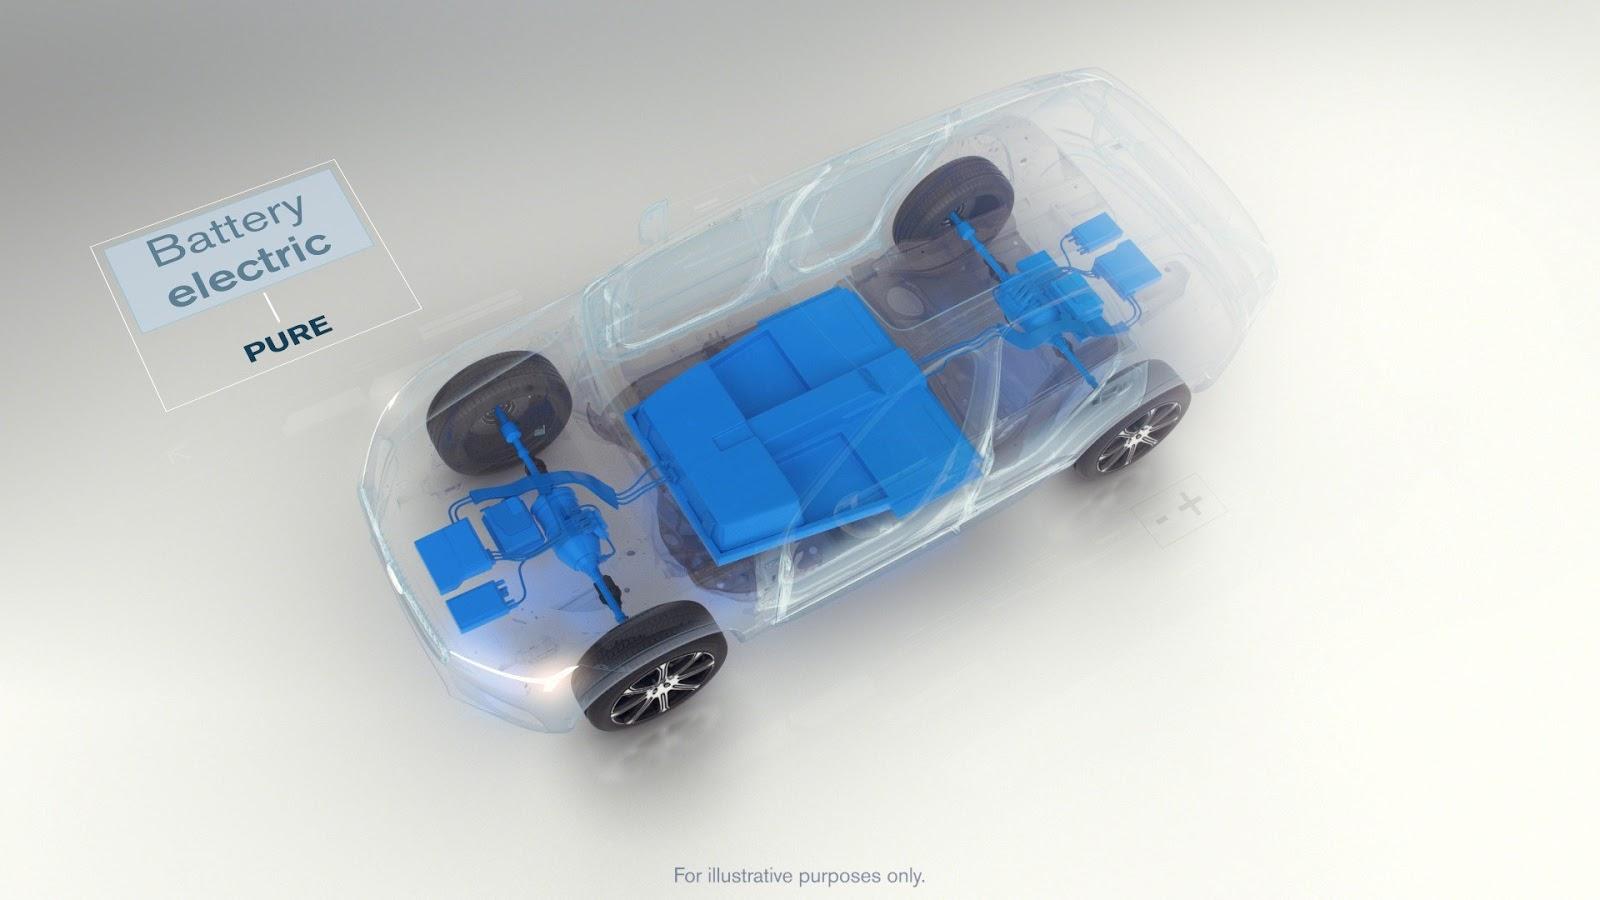 VOLVO BATTERY2BELECTRIC PURE Από το 2019, όλα τα Volvo θα έχουν ηλεκτροκινητήρα Hybrid, Volvo, zblog, καινούργιο, καινούρια, υβριδικό